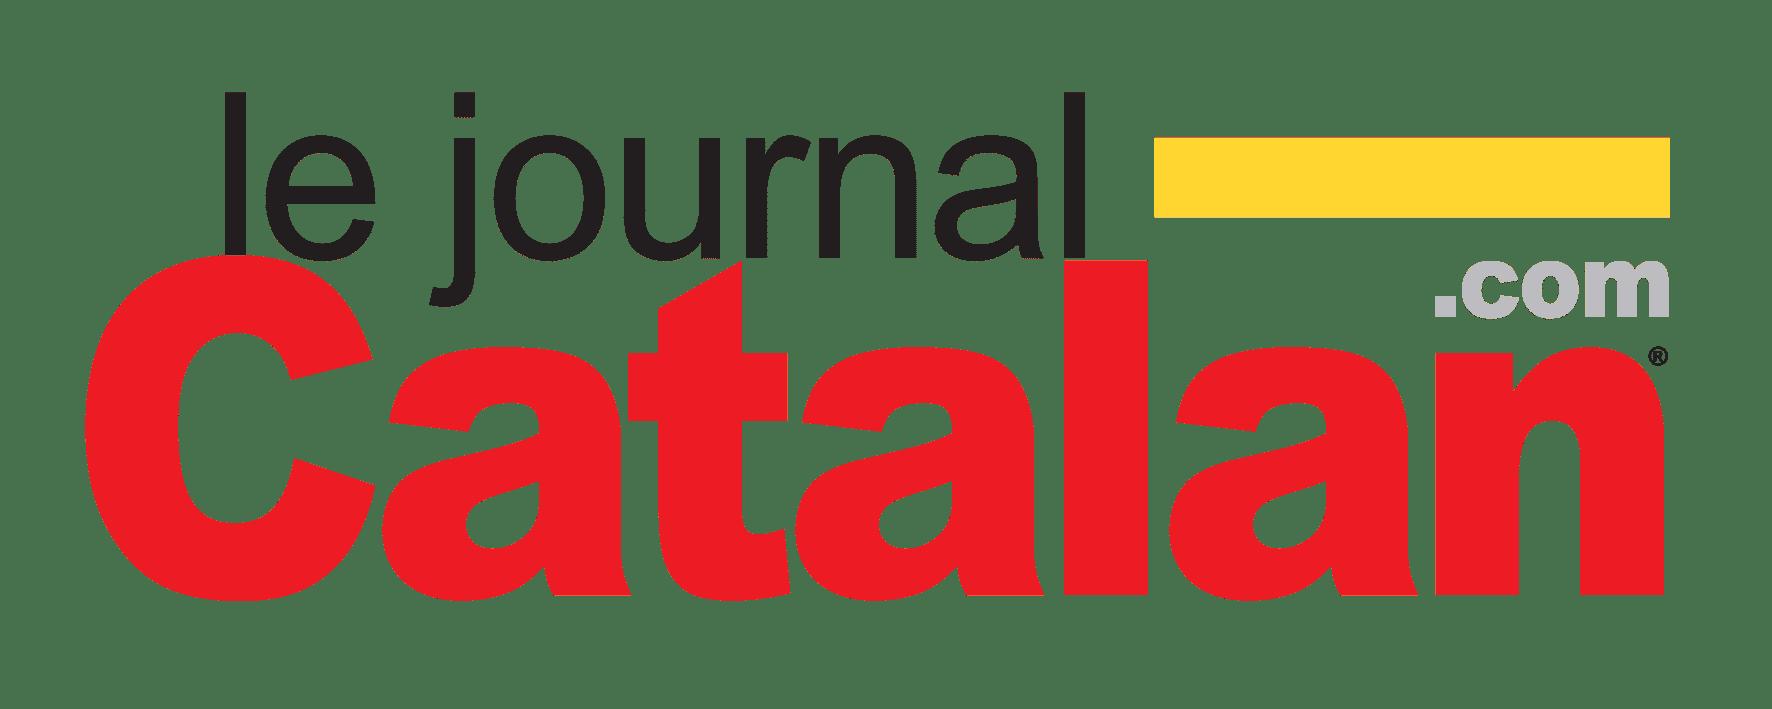 le journal catalan logo